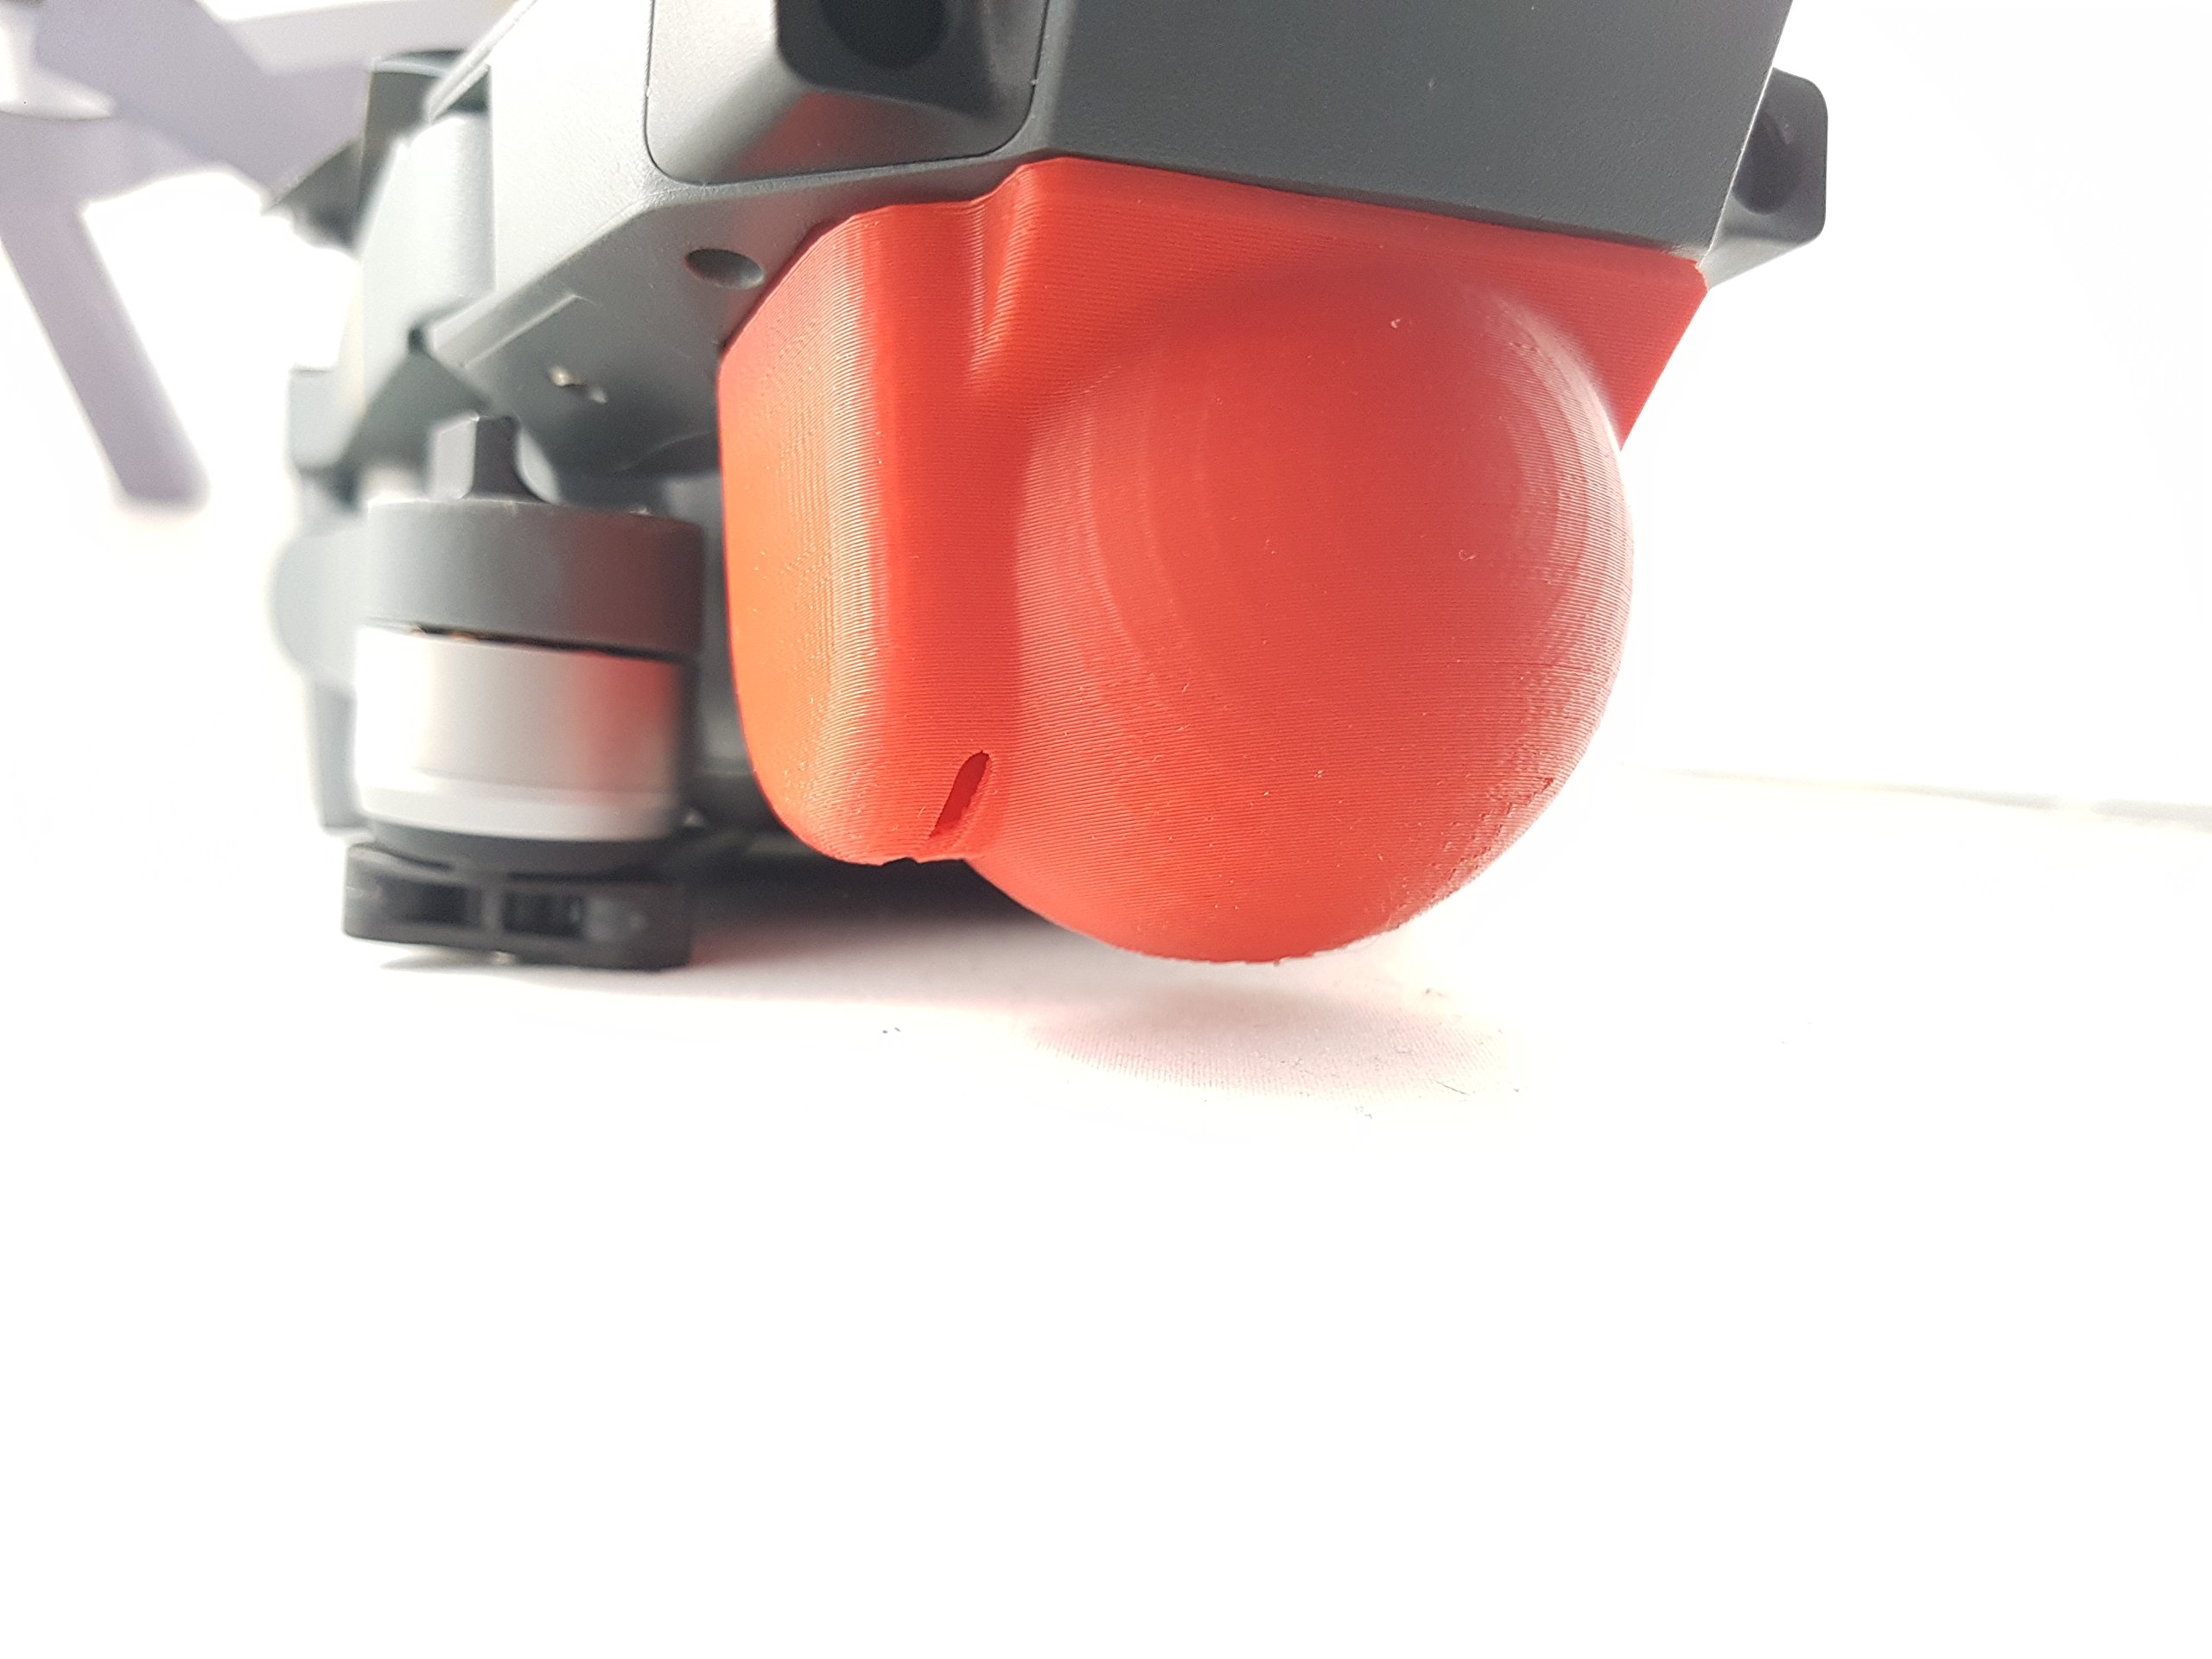 Mavic Lens Hood Gimbal Lock Protective Cover for For DJI Mavic pro lock dome by Thekkiinngg